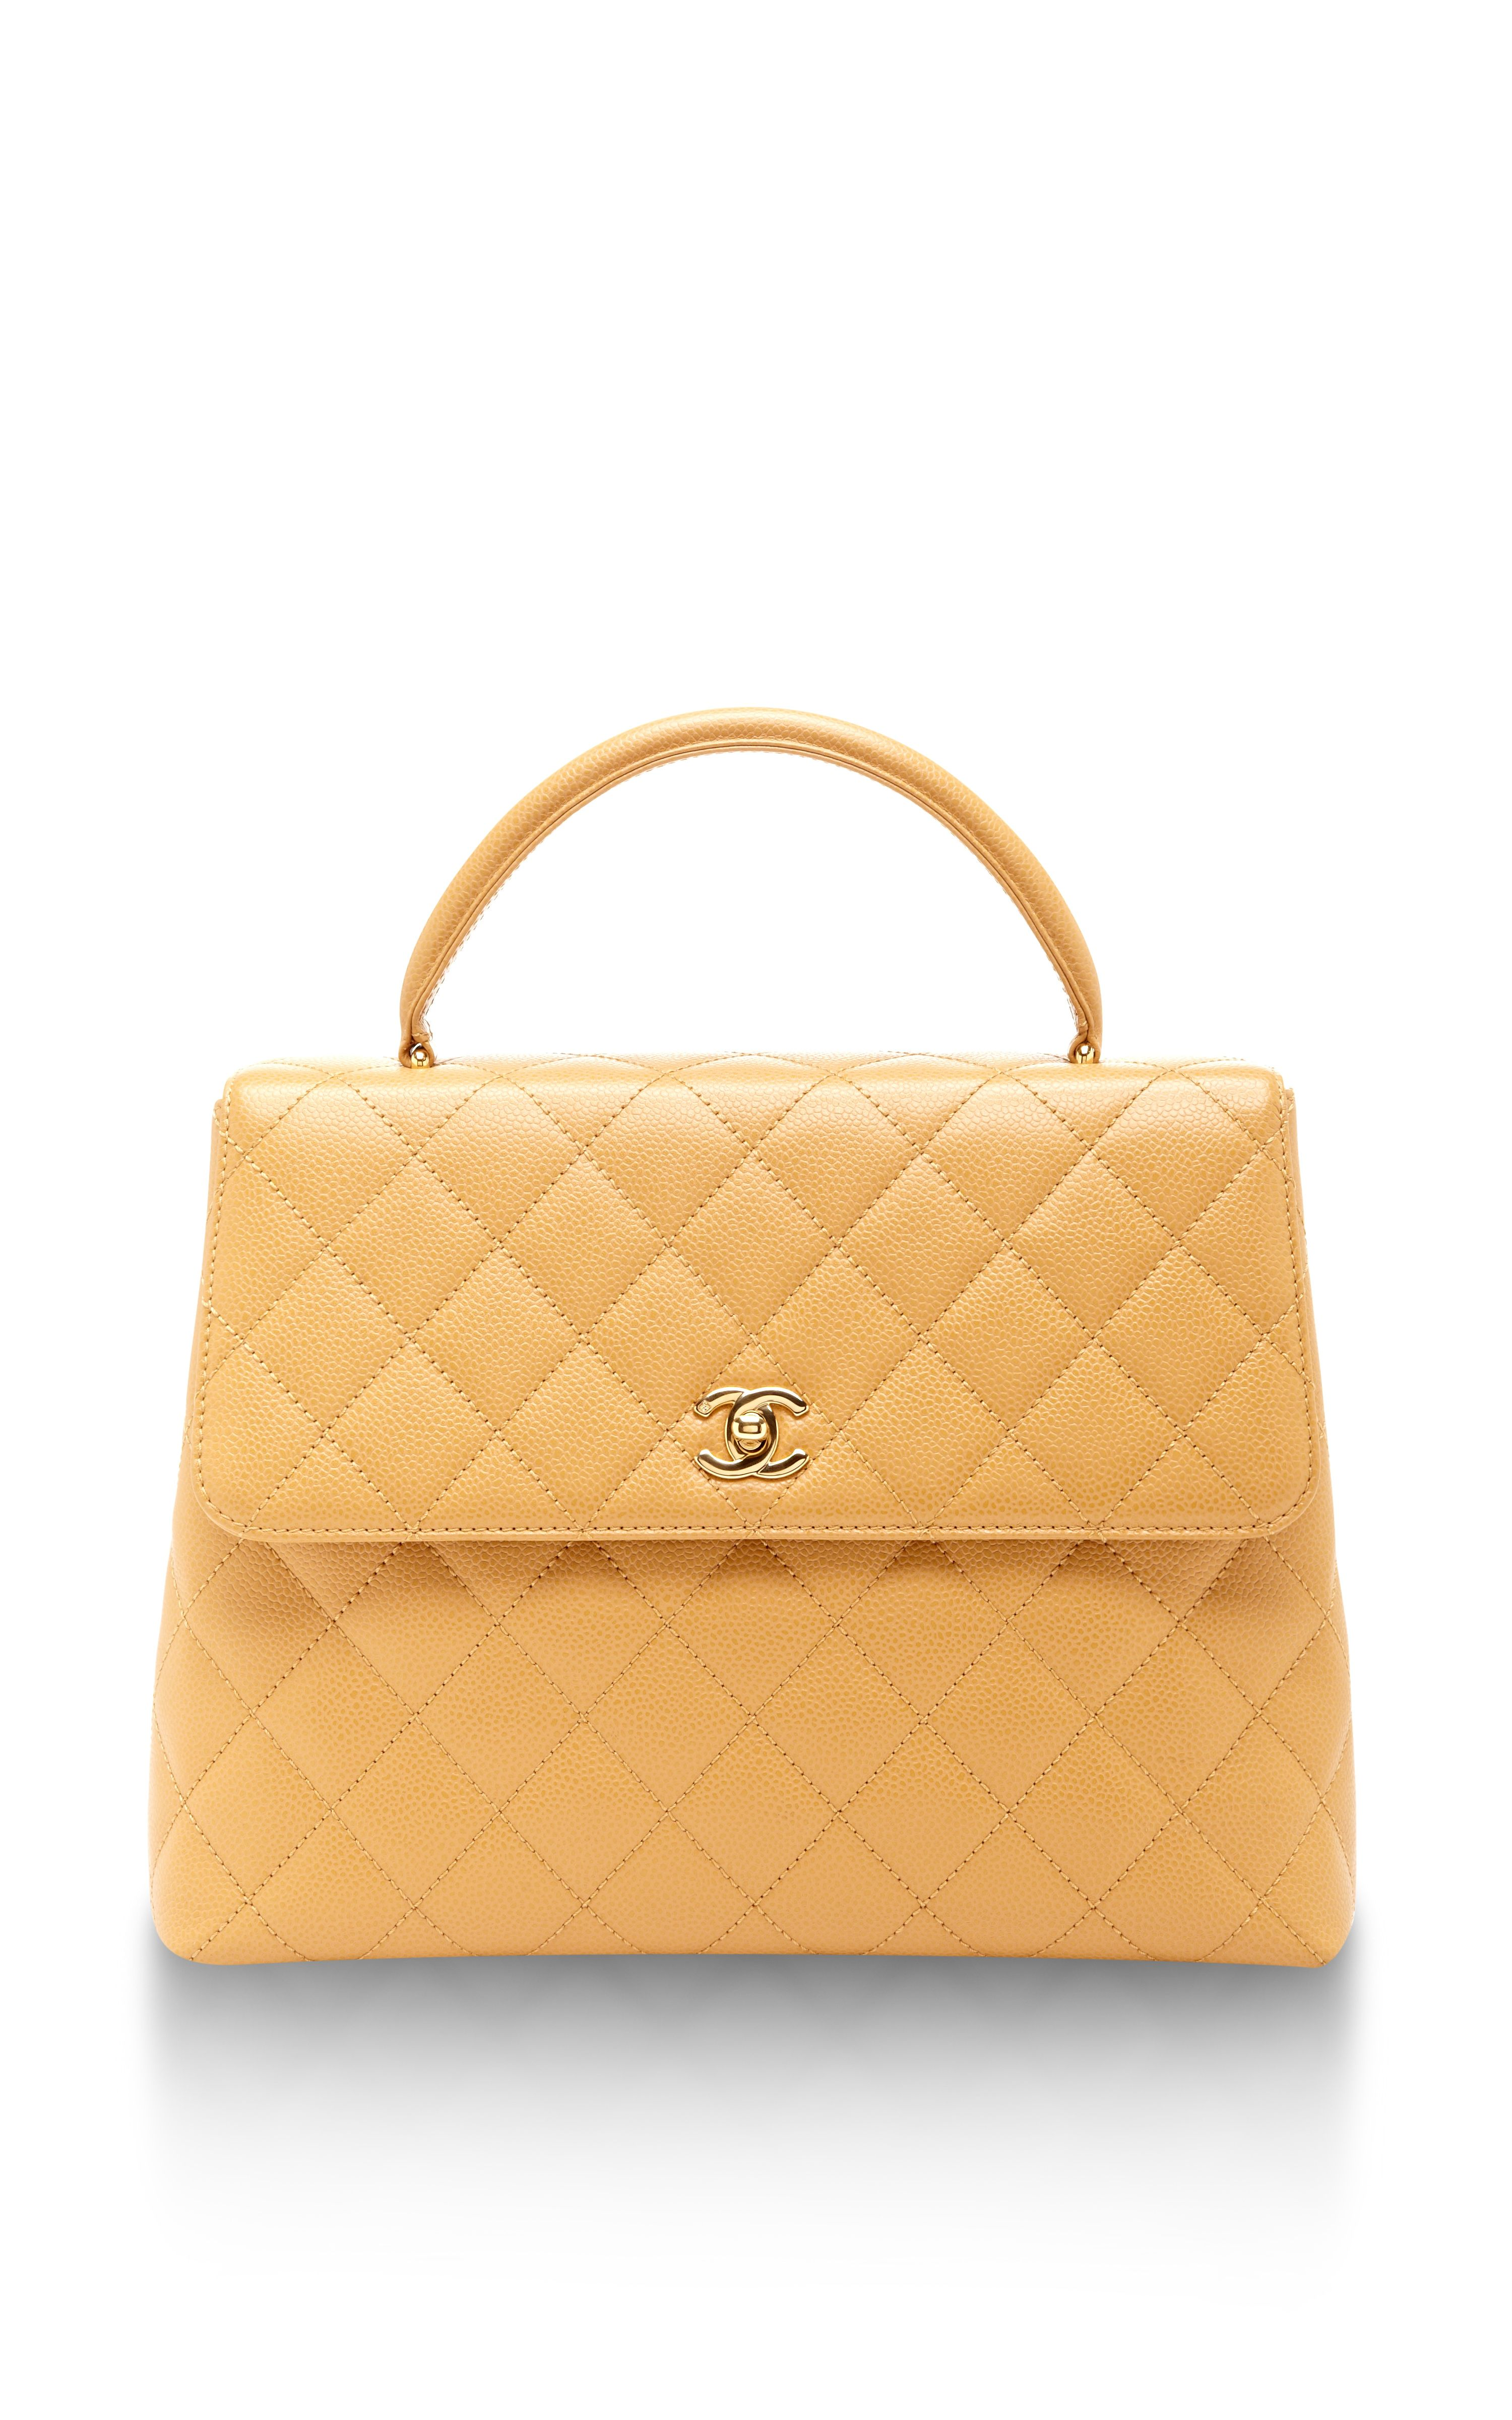 Vintage Chanel Tan Caviar Kelly Bag  f9415bc03846e